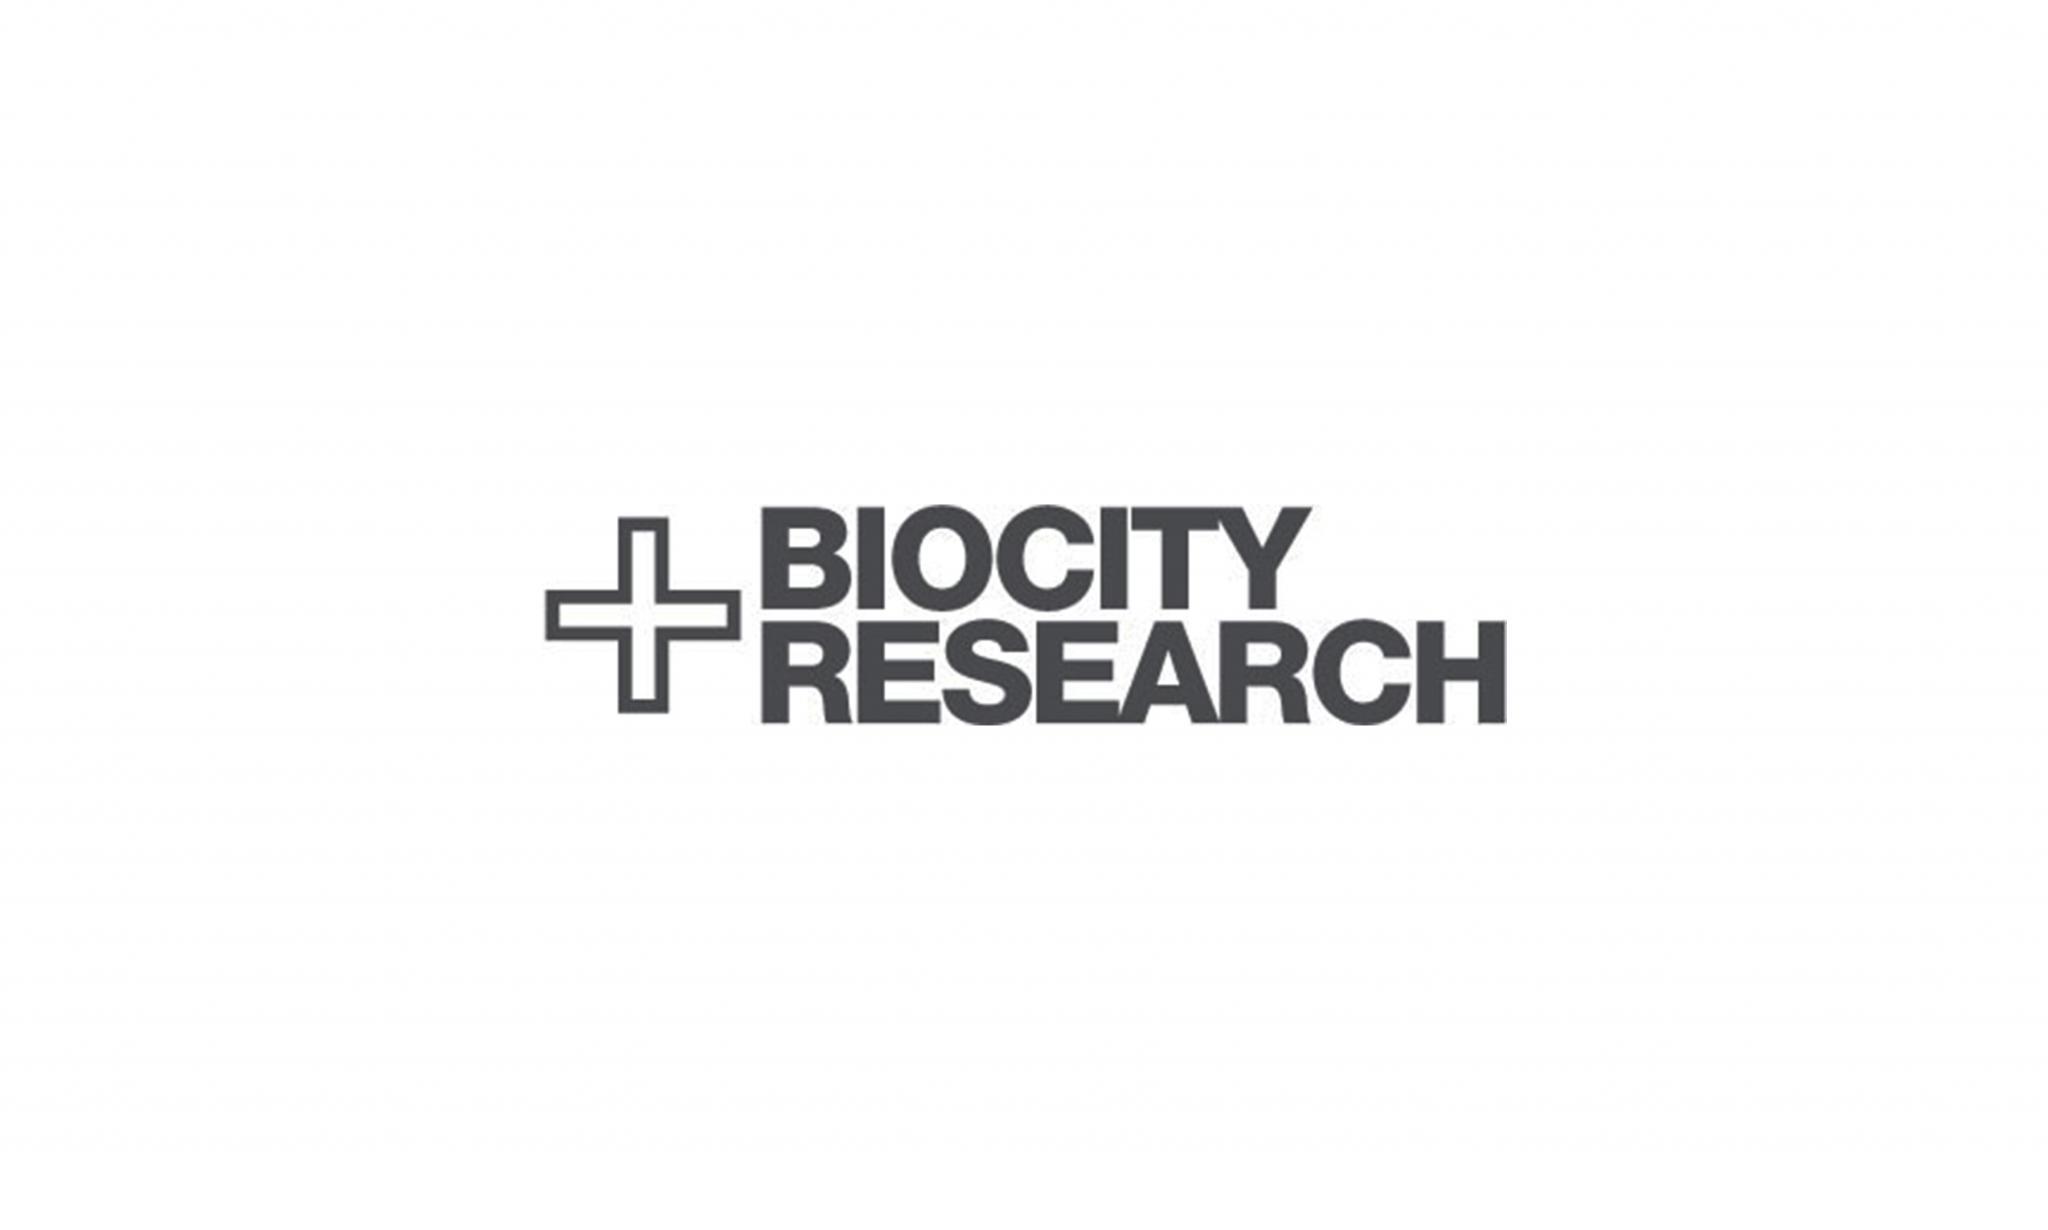 Biocity Research